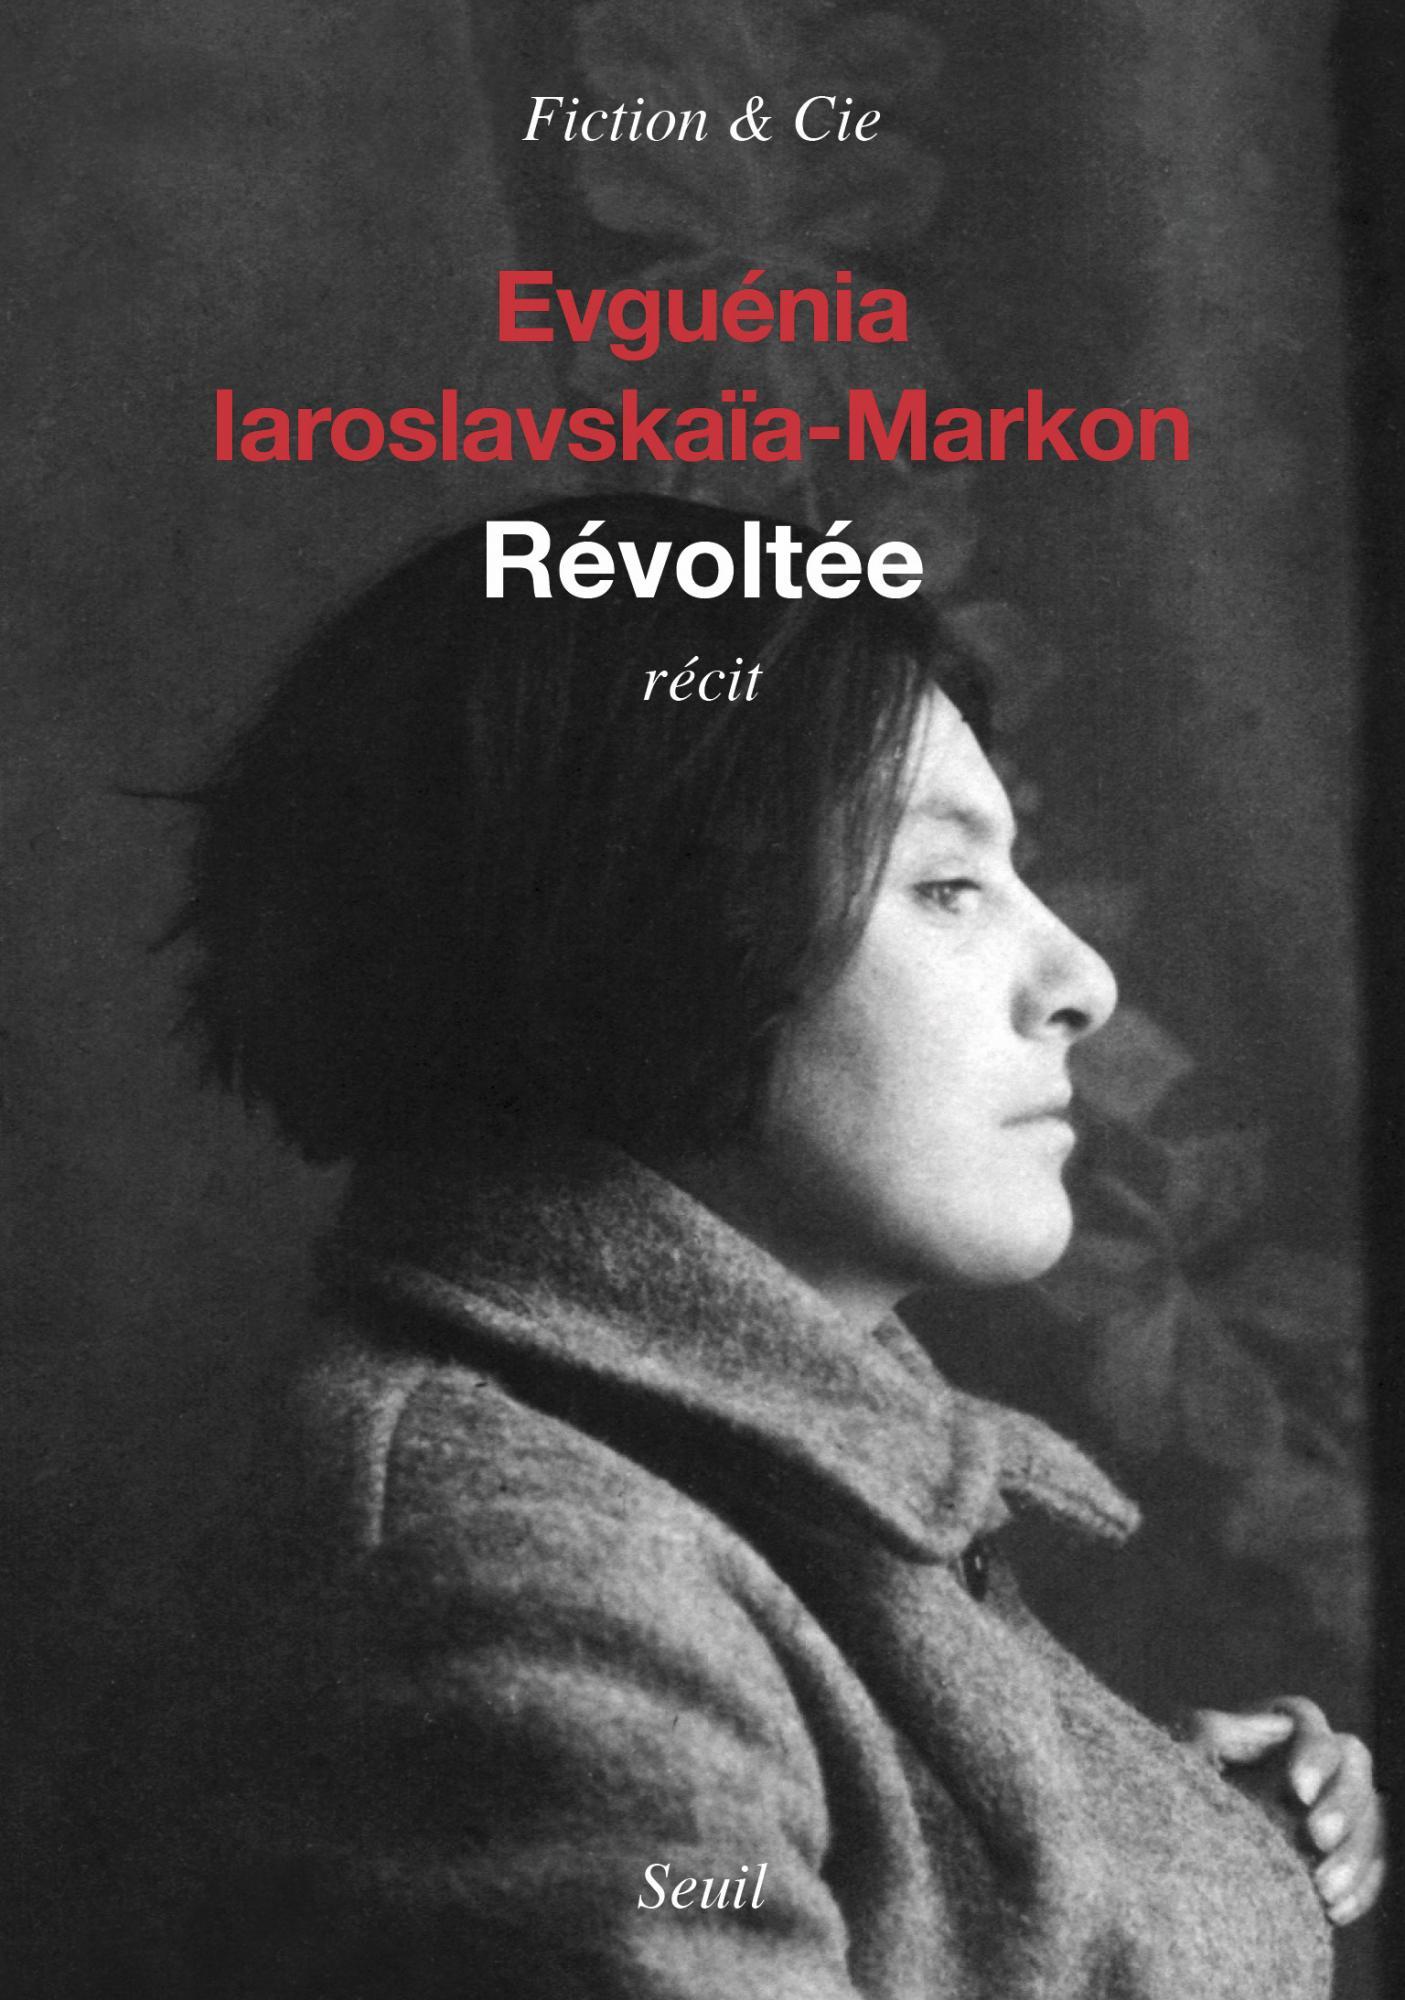 Révoltée (2017) - Evguenia Iaroslavskaia-markon